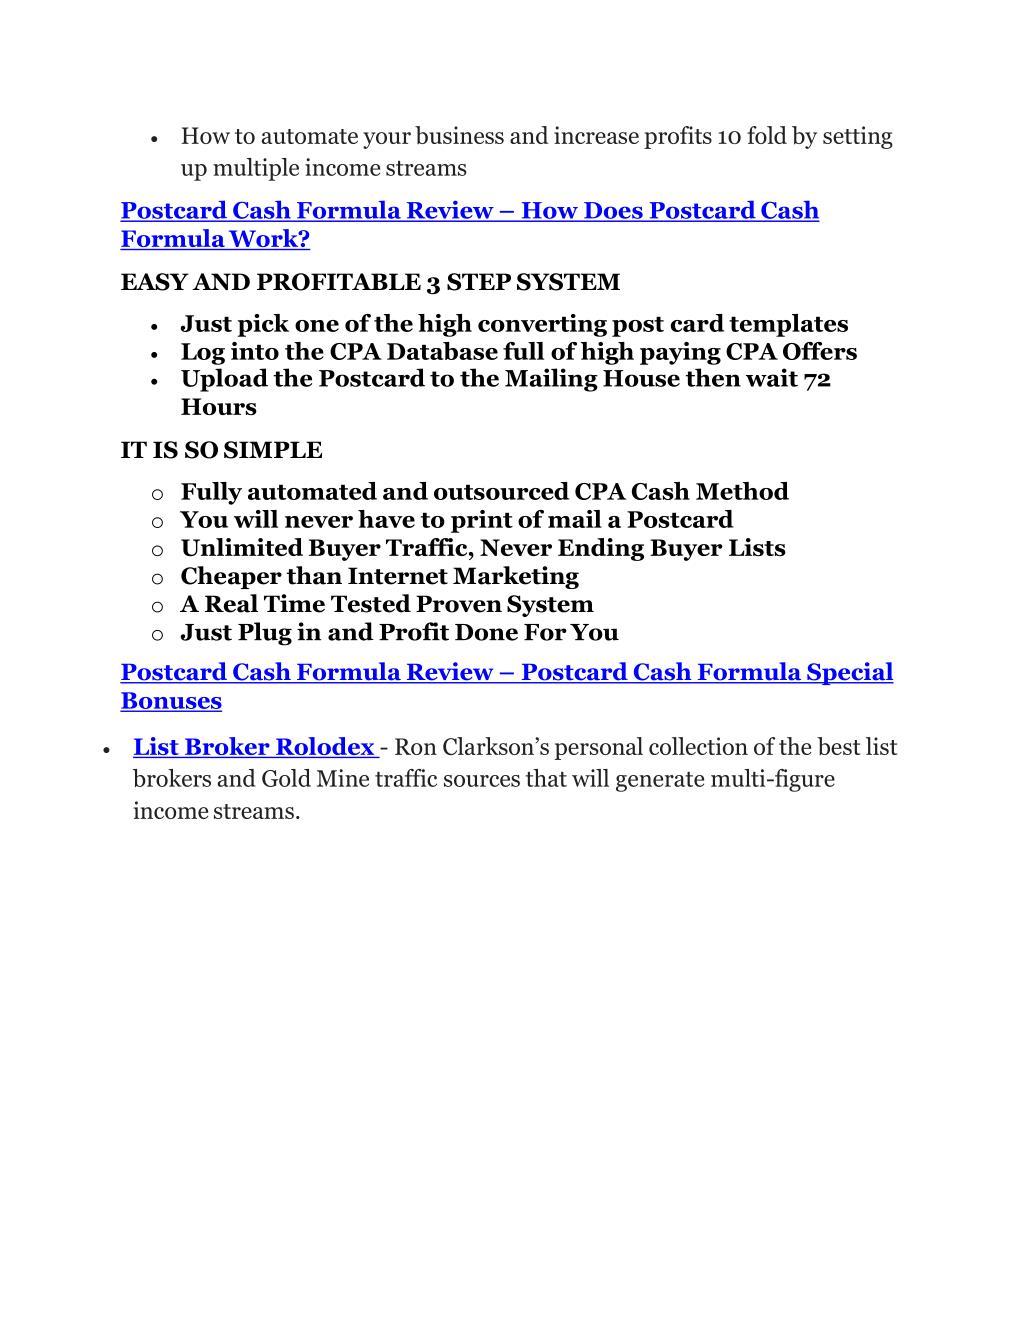 PPT - Postcard Cash Formula Review - Postcard Cash Formula DEMO